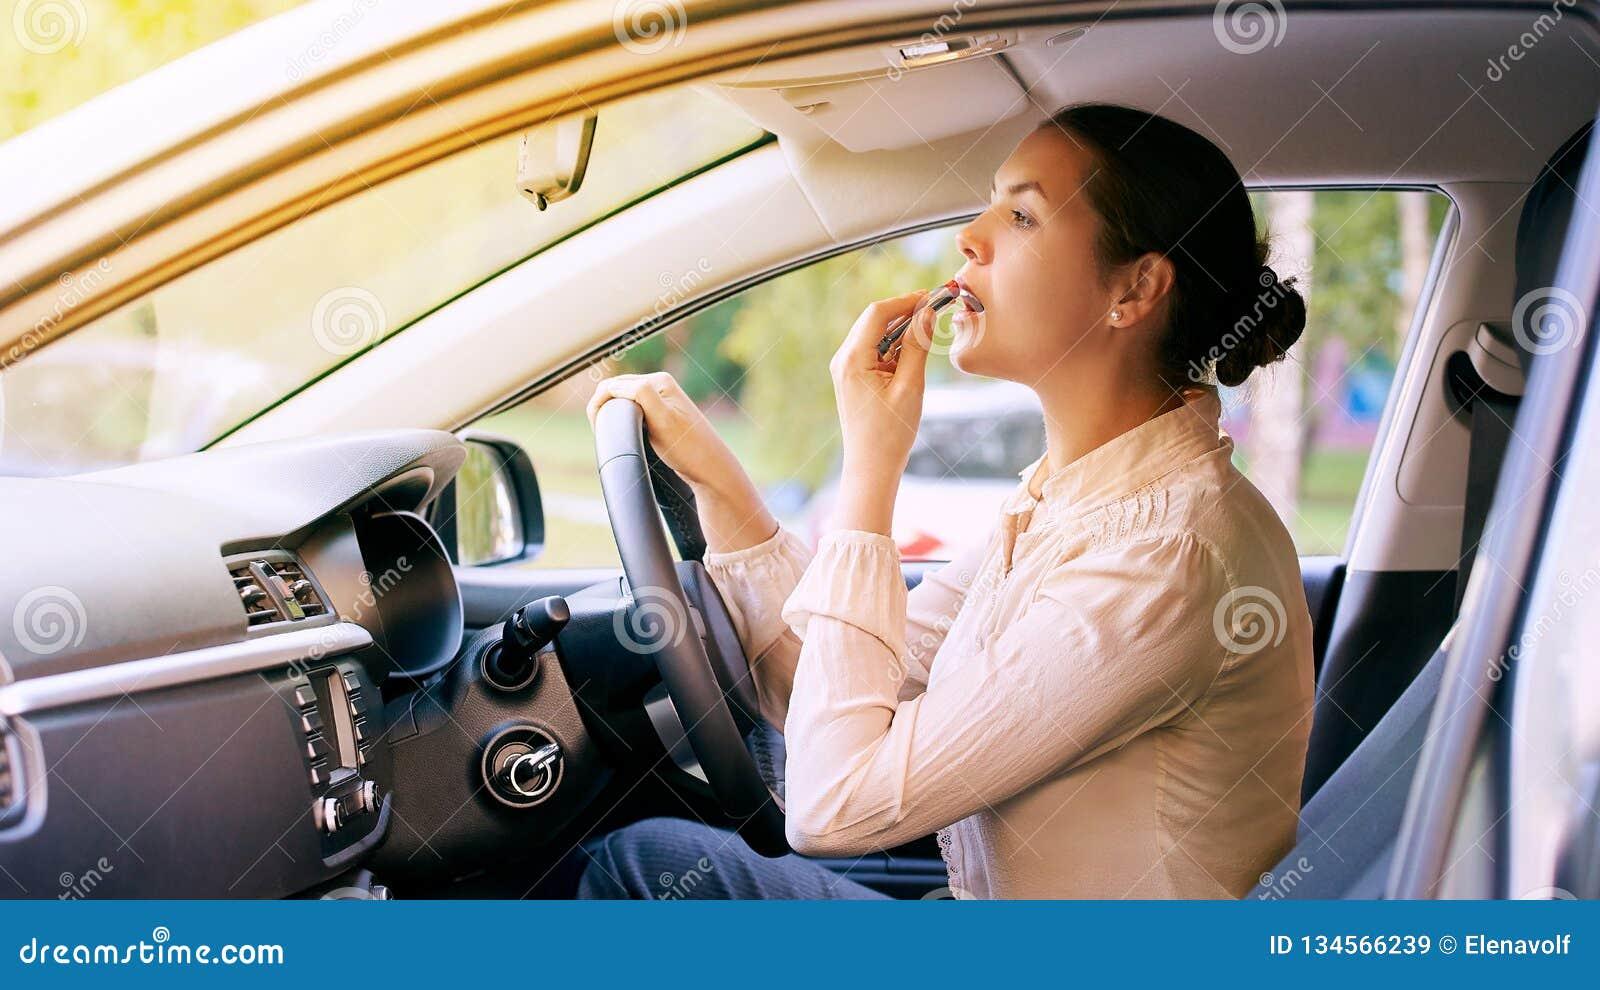 Woman using lipstick inside car. Urban background. Bad busy